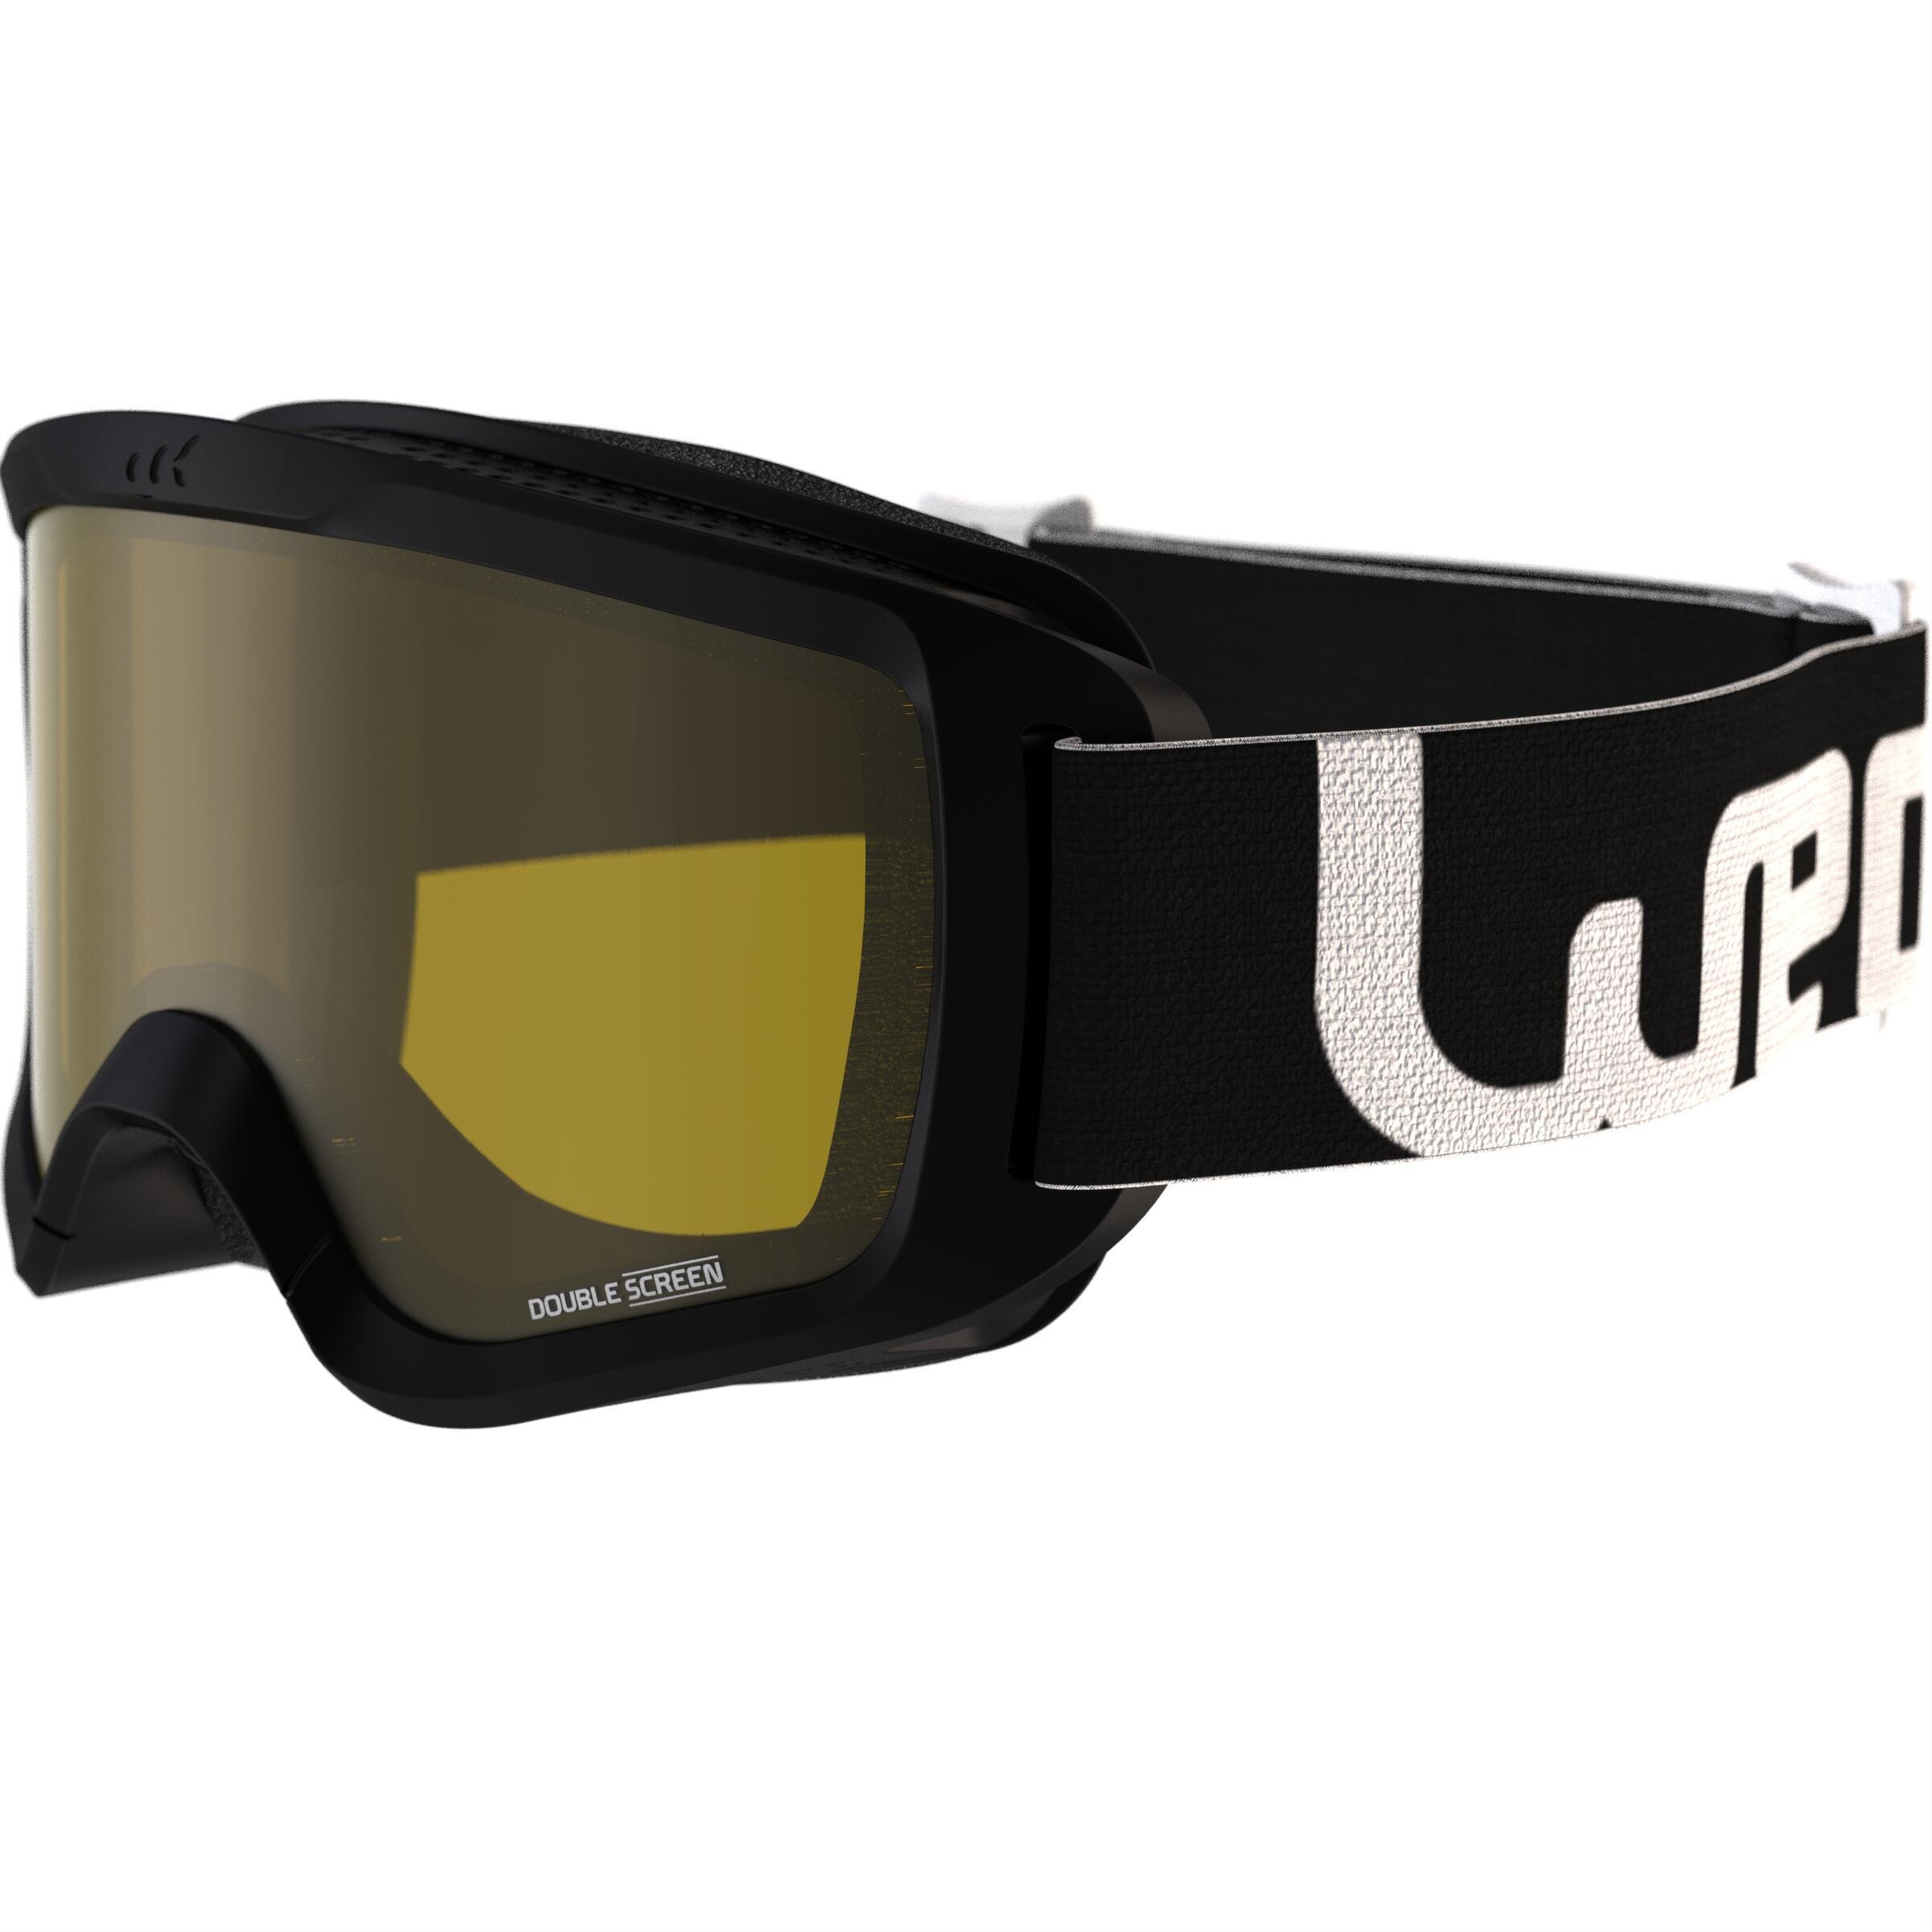 Wed'ze Ski- en snowboardbril Snow 300 bewolkt weer zwart - P thumbnail